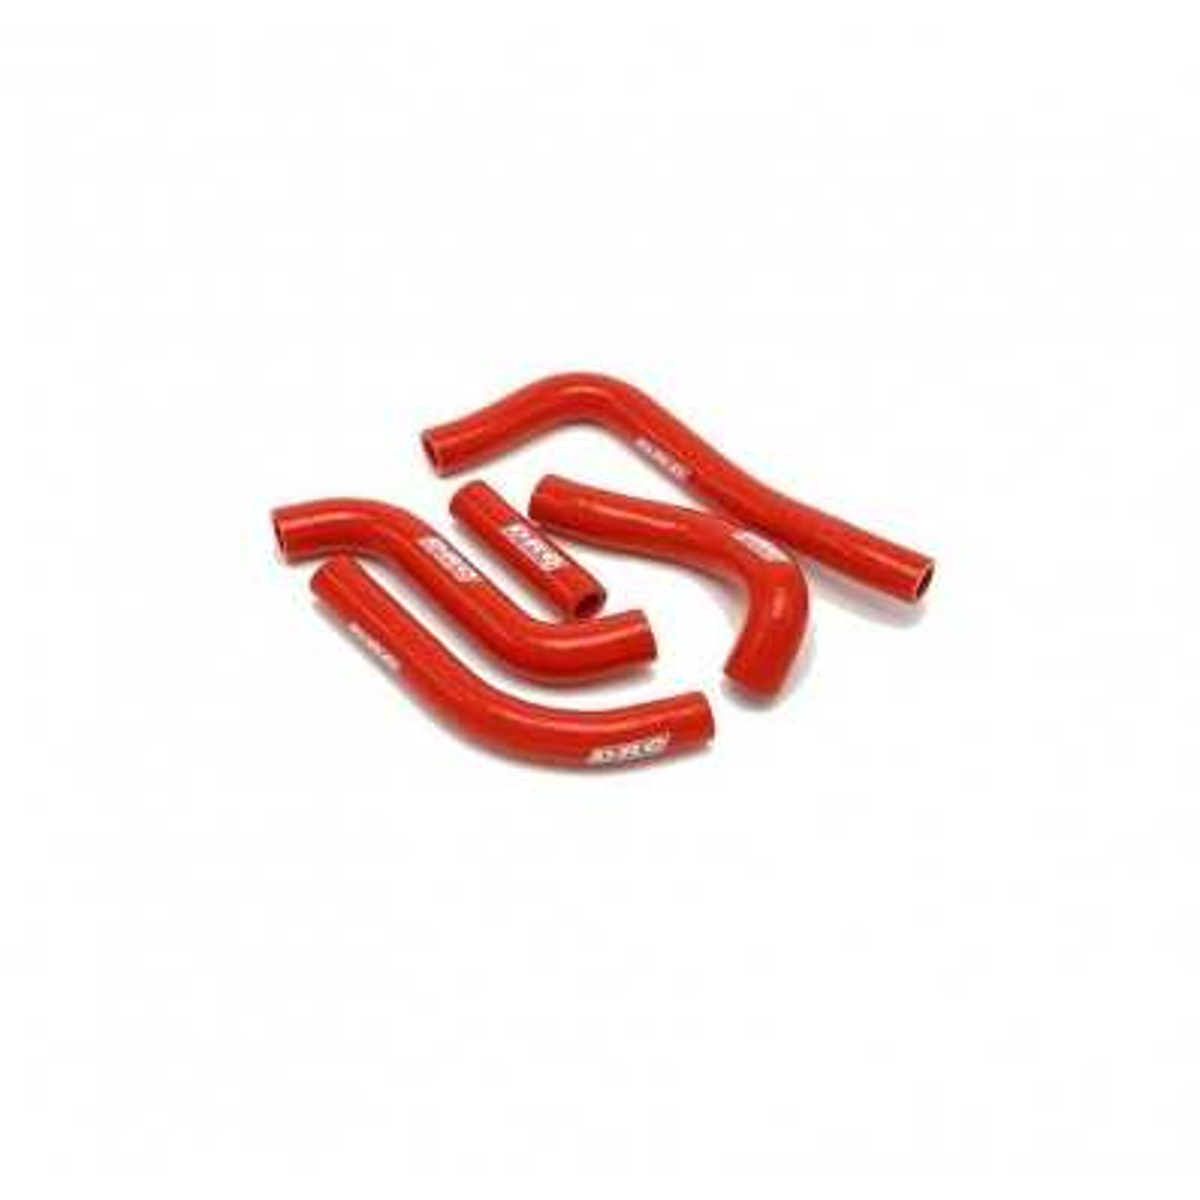 D47.01.053 - Kit Manguitos Radiador Honda Crf250R ´10 Rojo